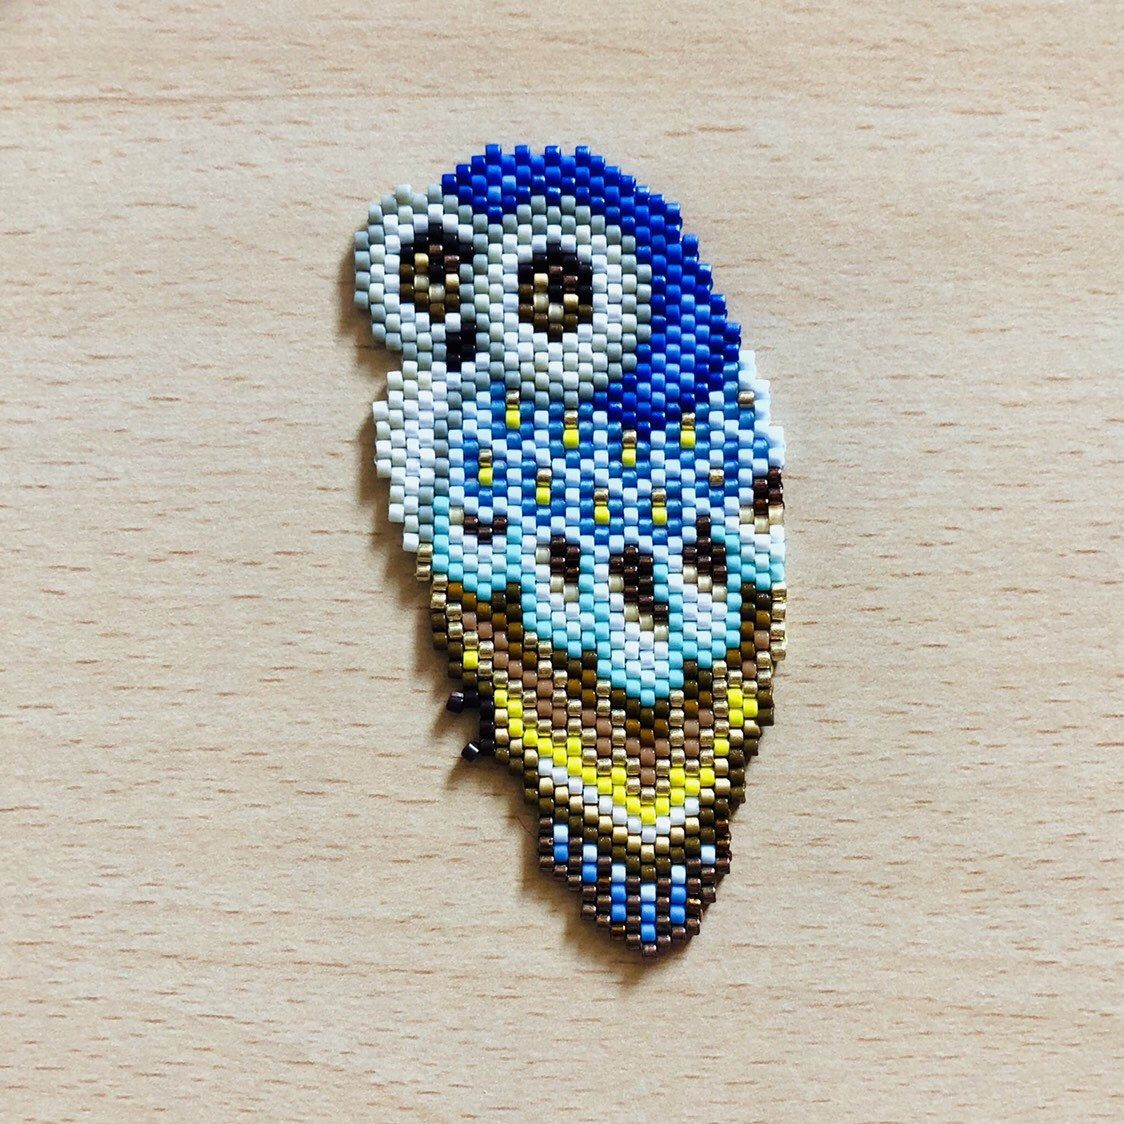 Diagramme tissage perles feuille  miyuki pattern  pattern miyuki  mod\u00e8le miyuki  diagramme perles  tissage perles